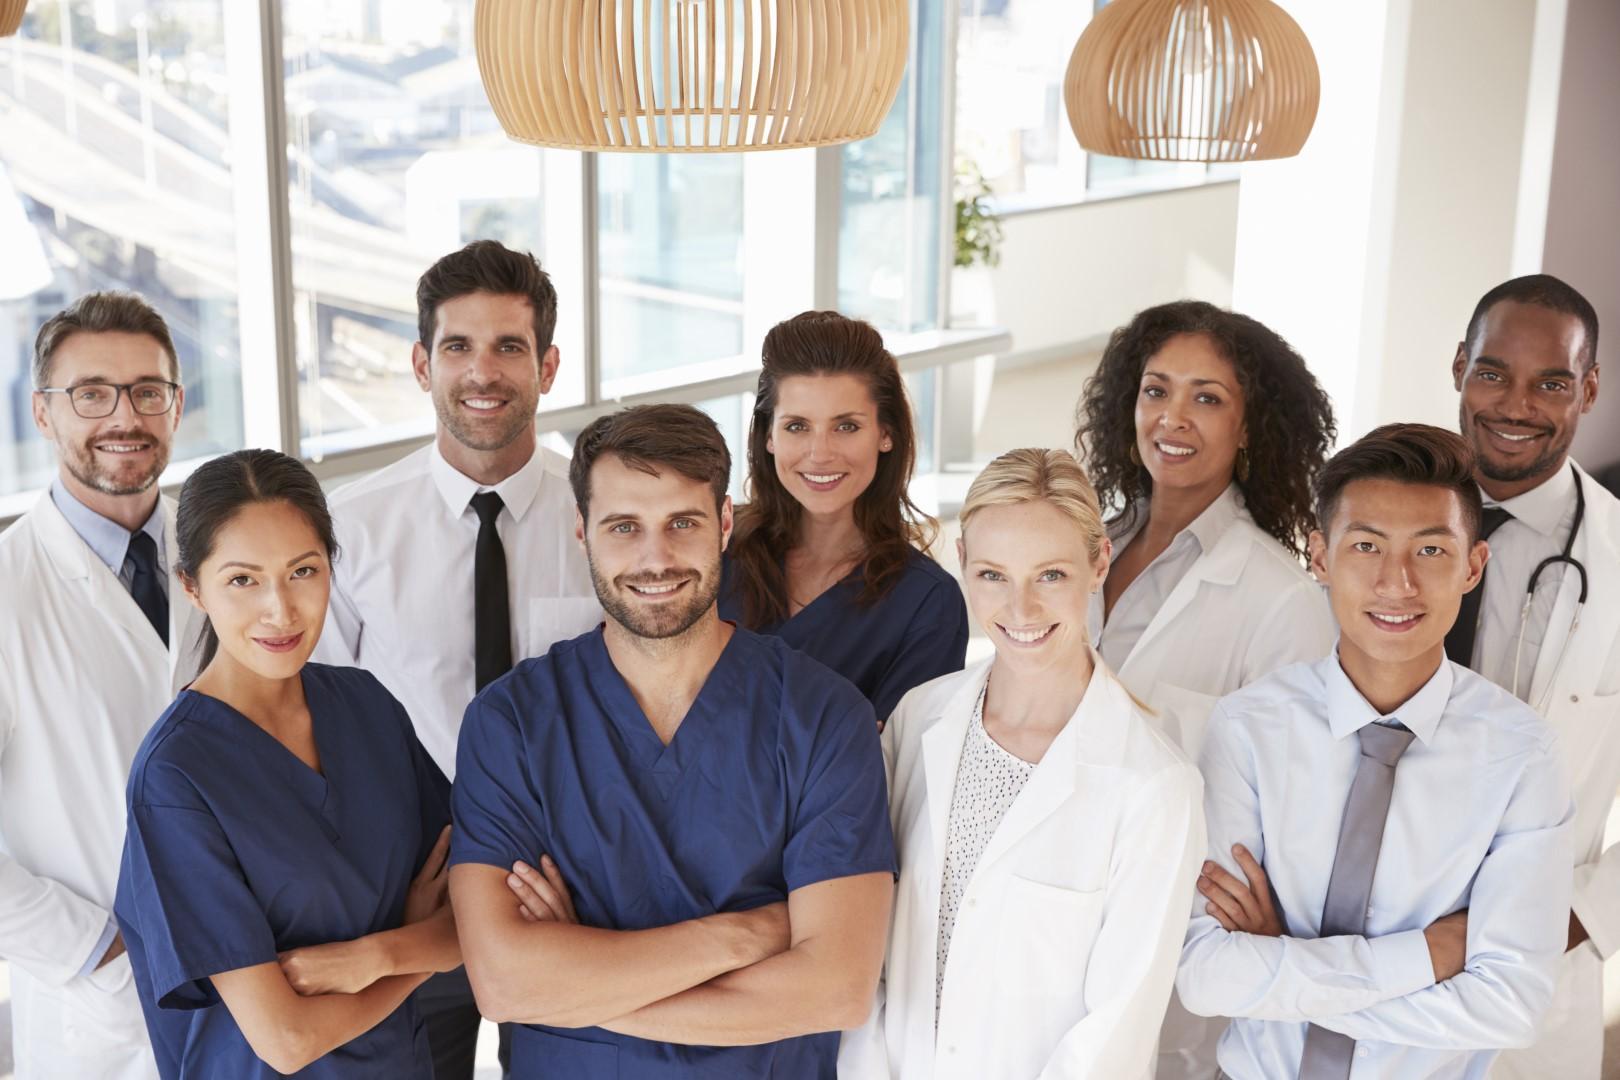 Image of medical team.